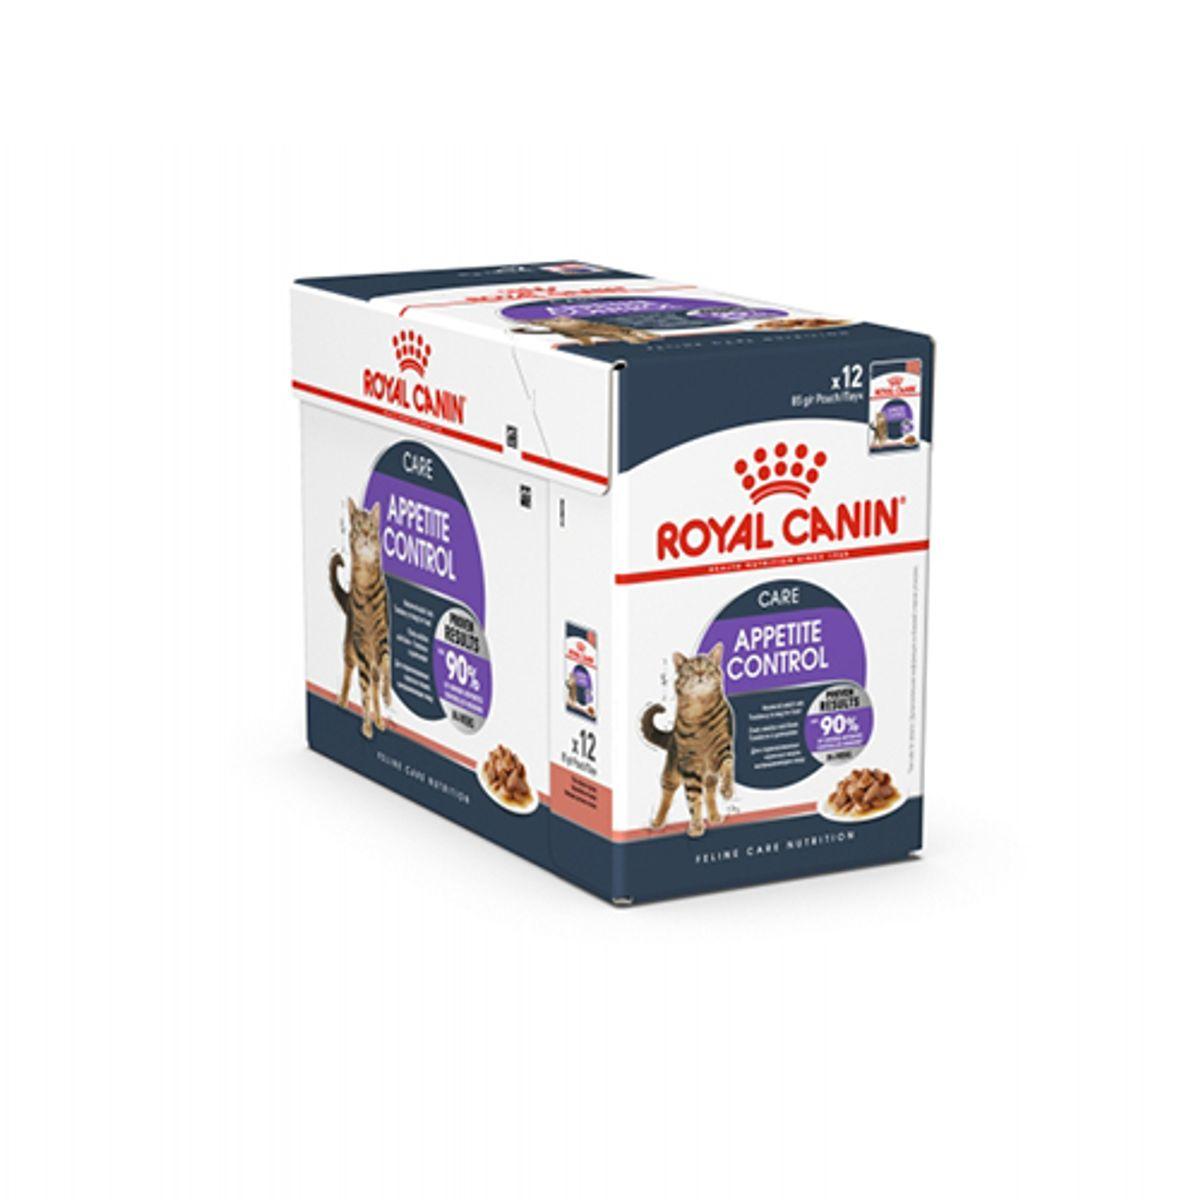 Royal Canin Appetite control våtfor 12x85gr